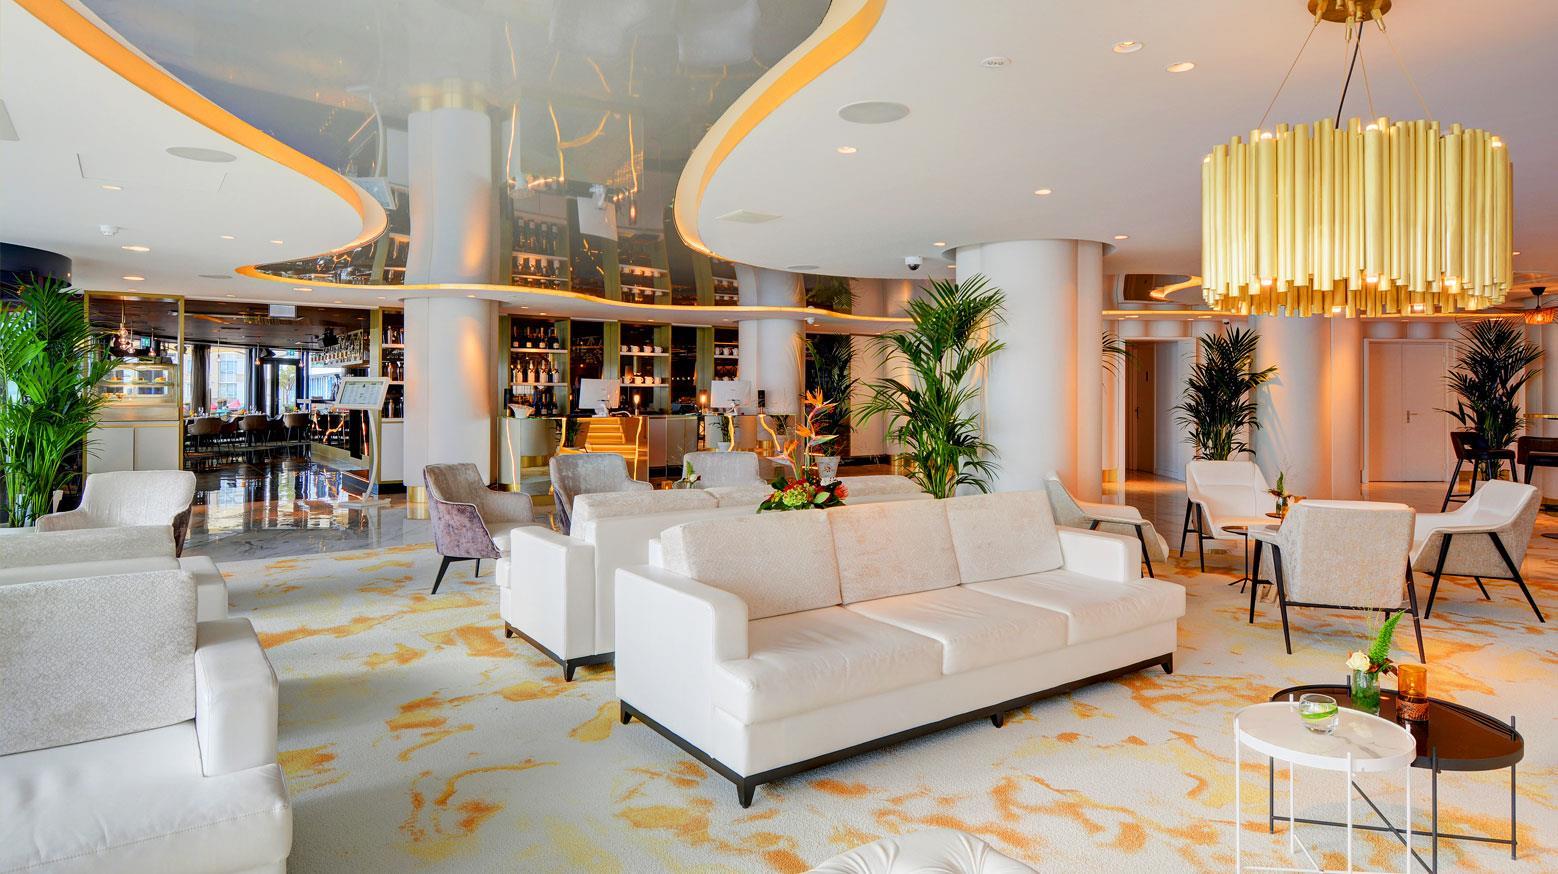 Hotel arion amadore hotels & restaurants zeeland grenzeloos